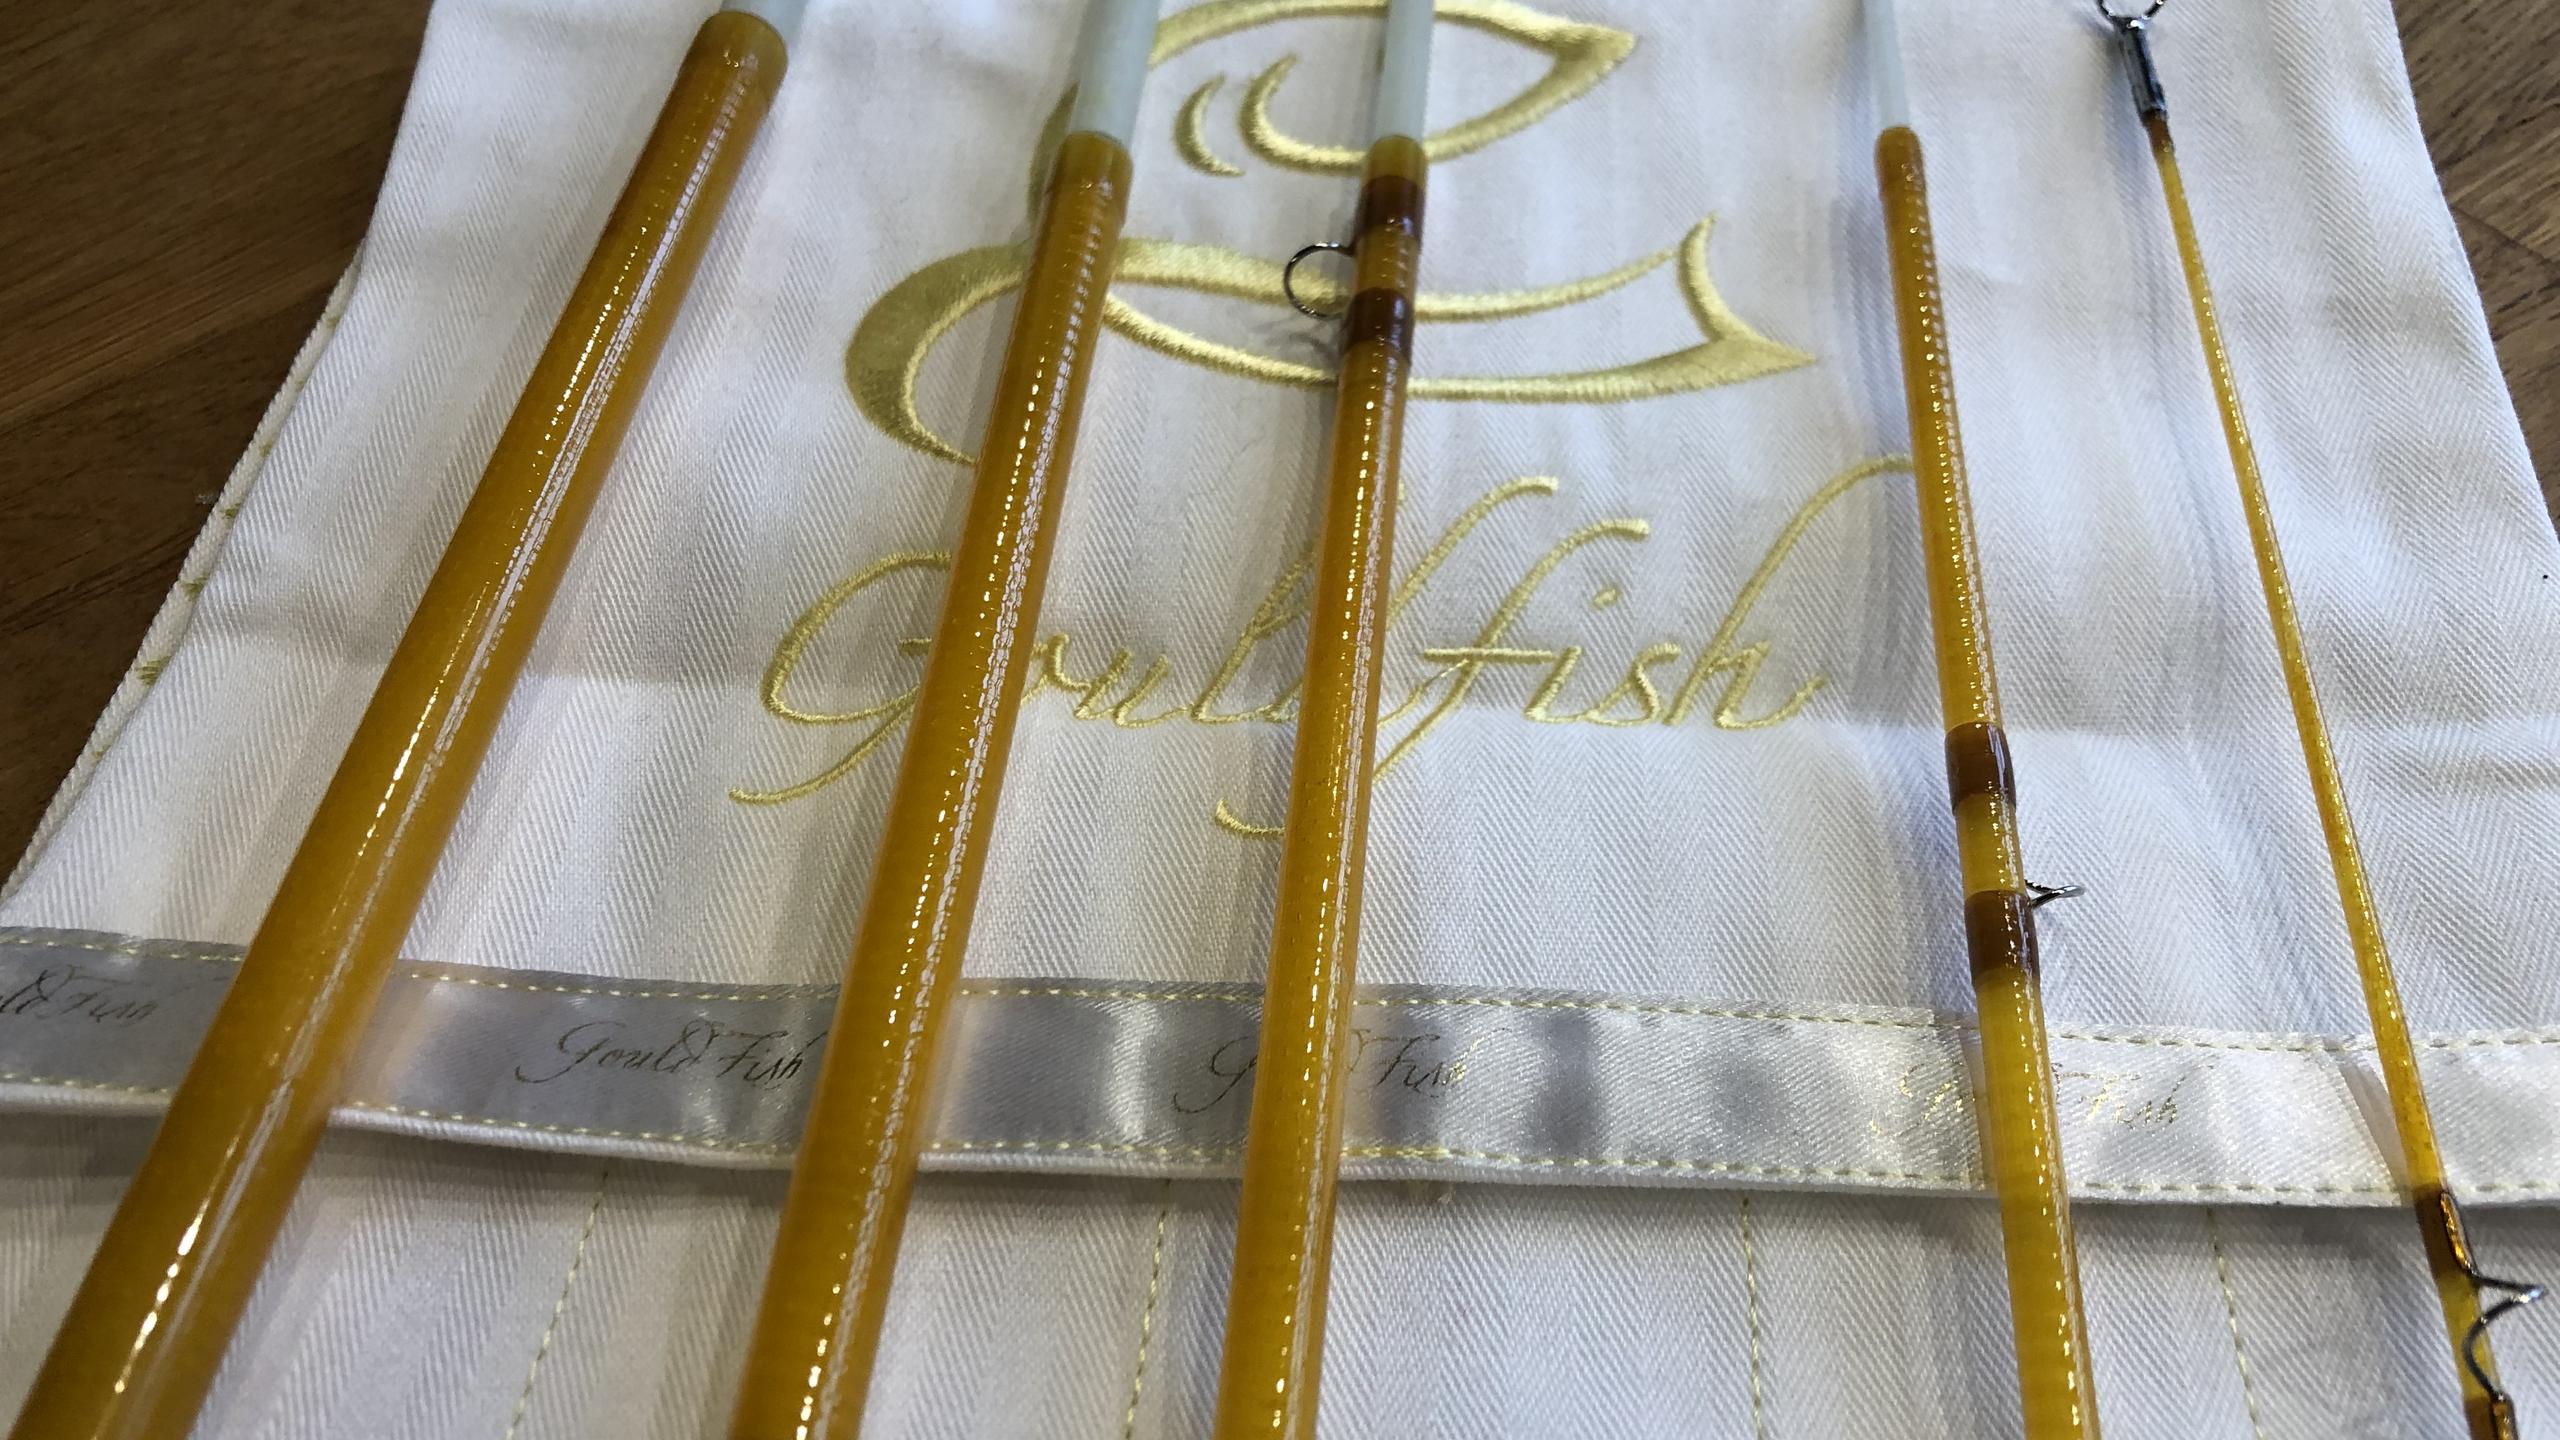 Kabuto 7'9 Pack Rod by Gouldfish